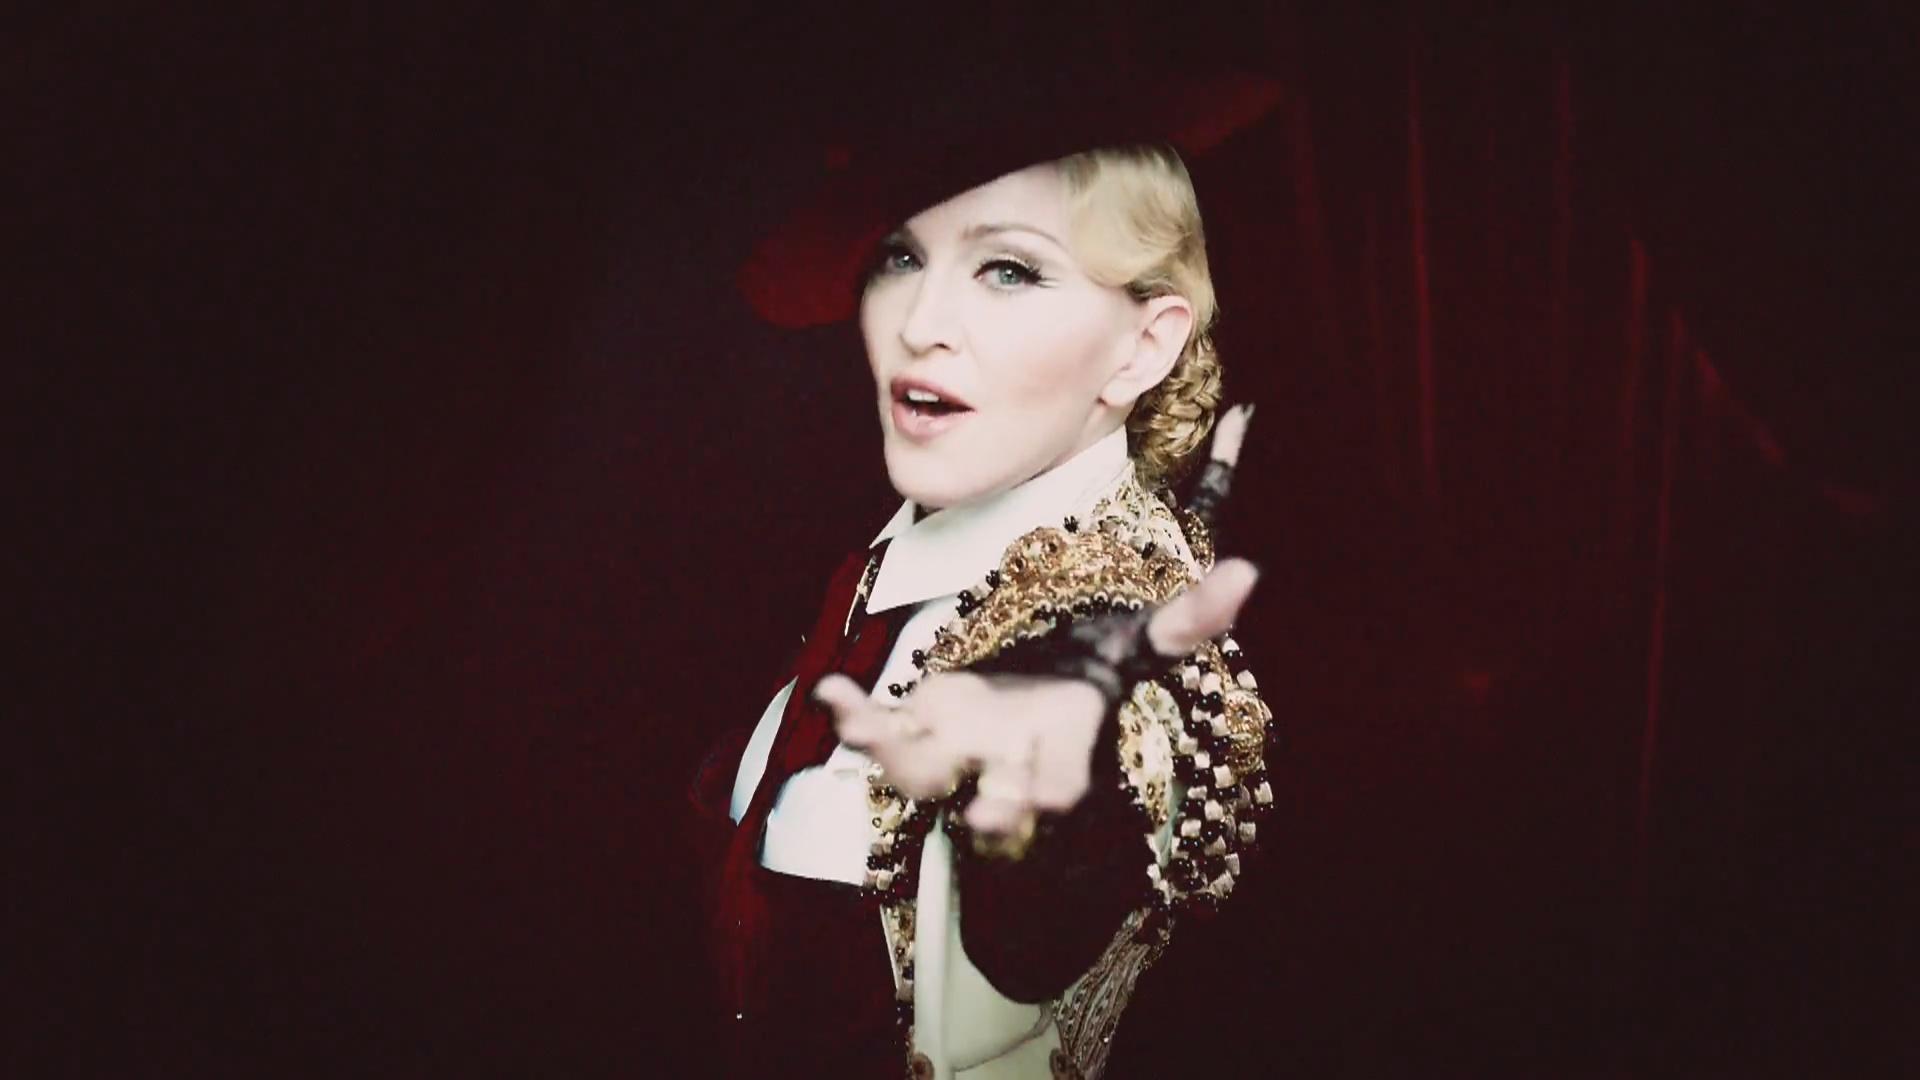 madonna living for love rebel heart video101